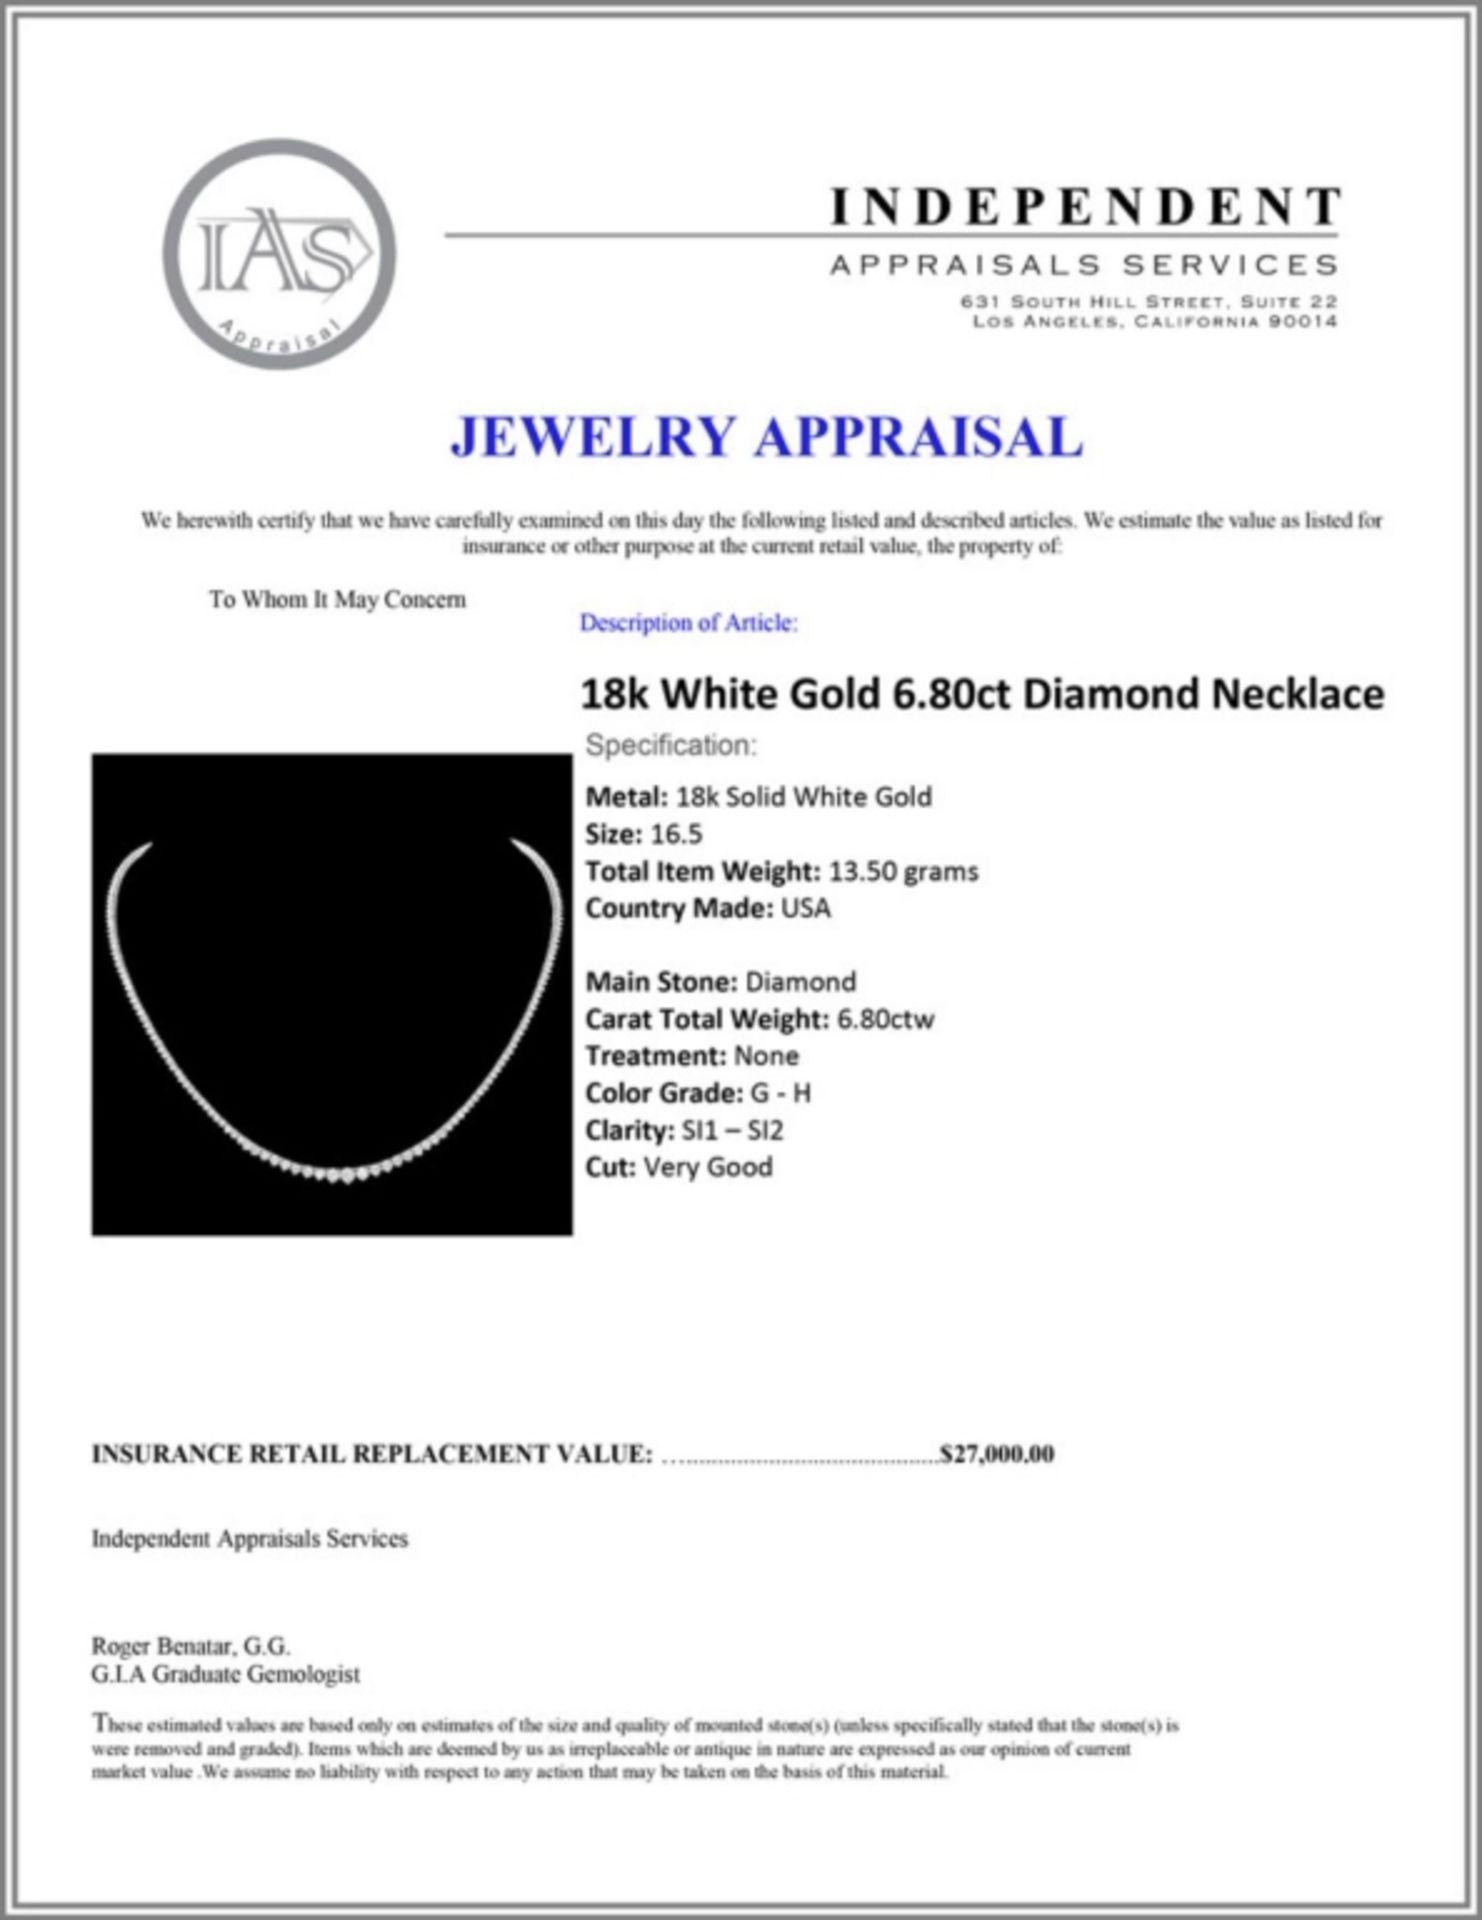 ^18k White Gold 6.80ct Diamond Necklace - Image 3 of 3